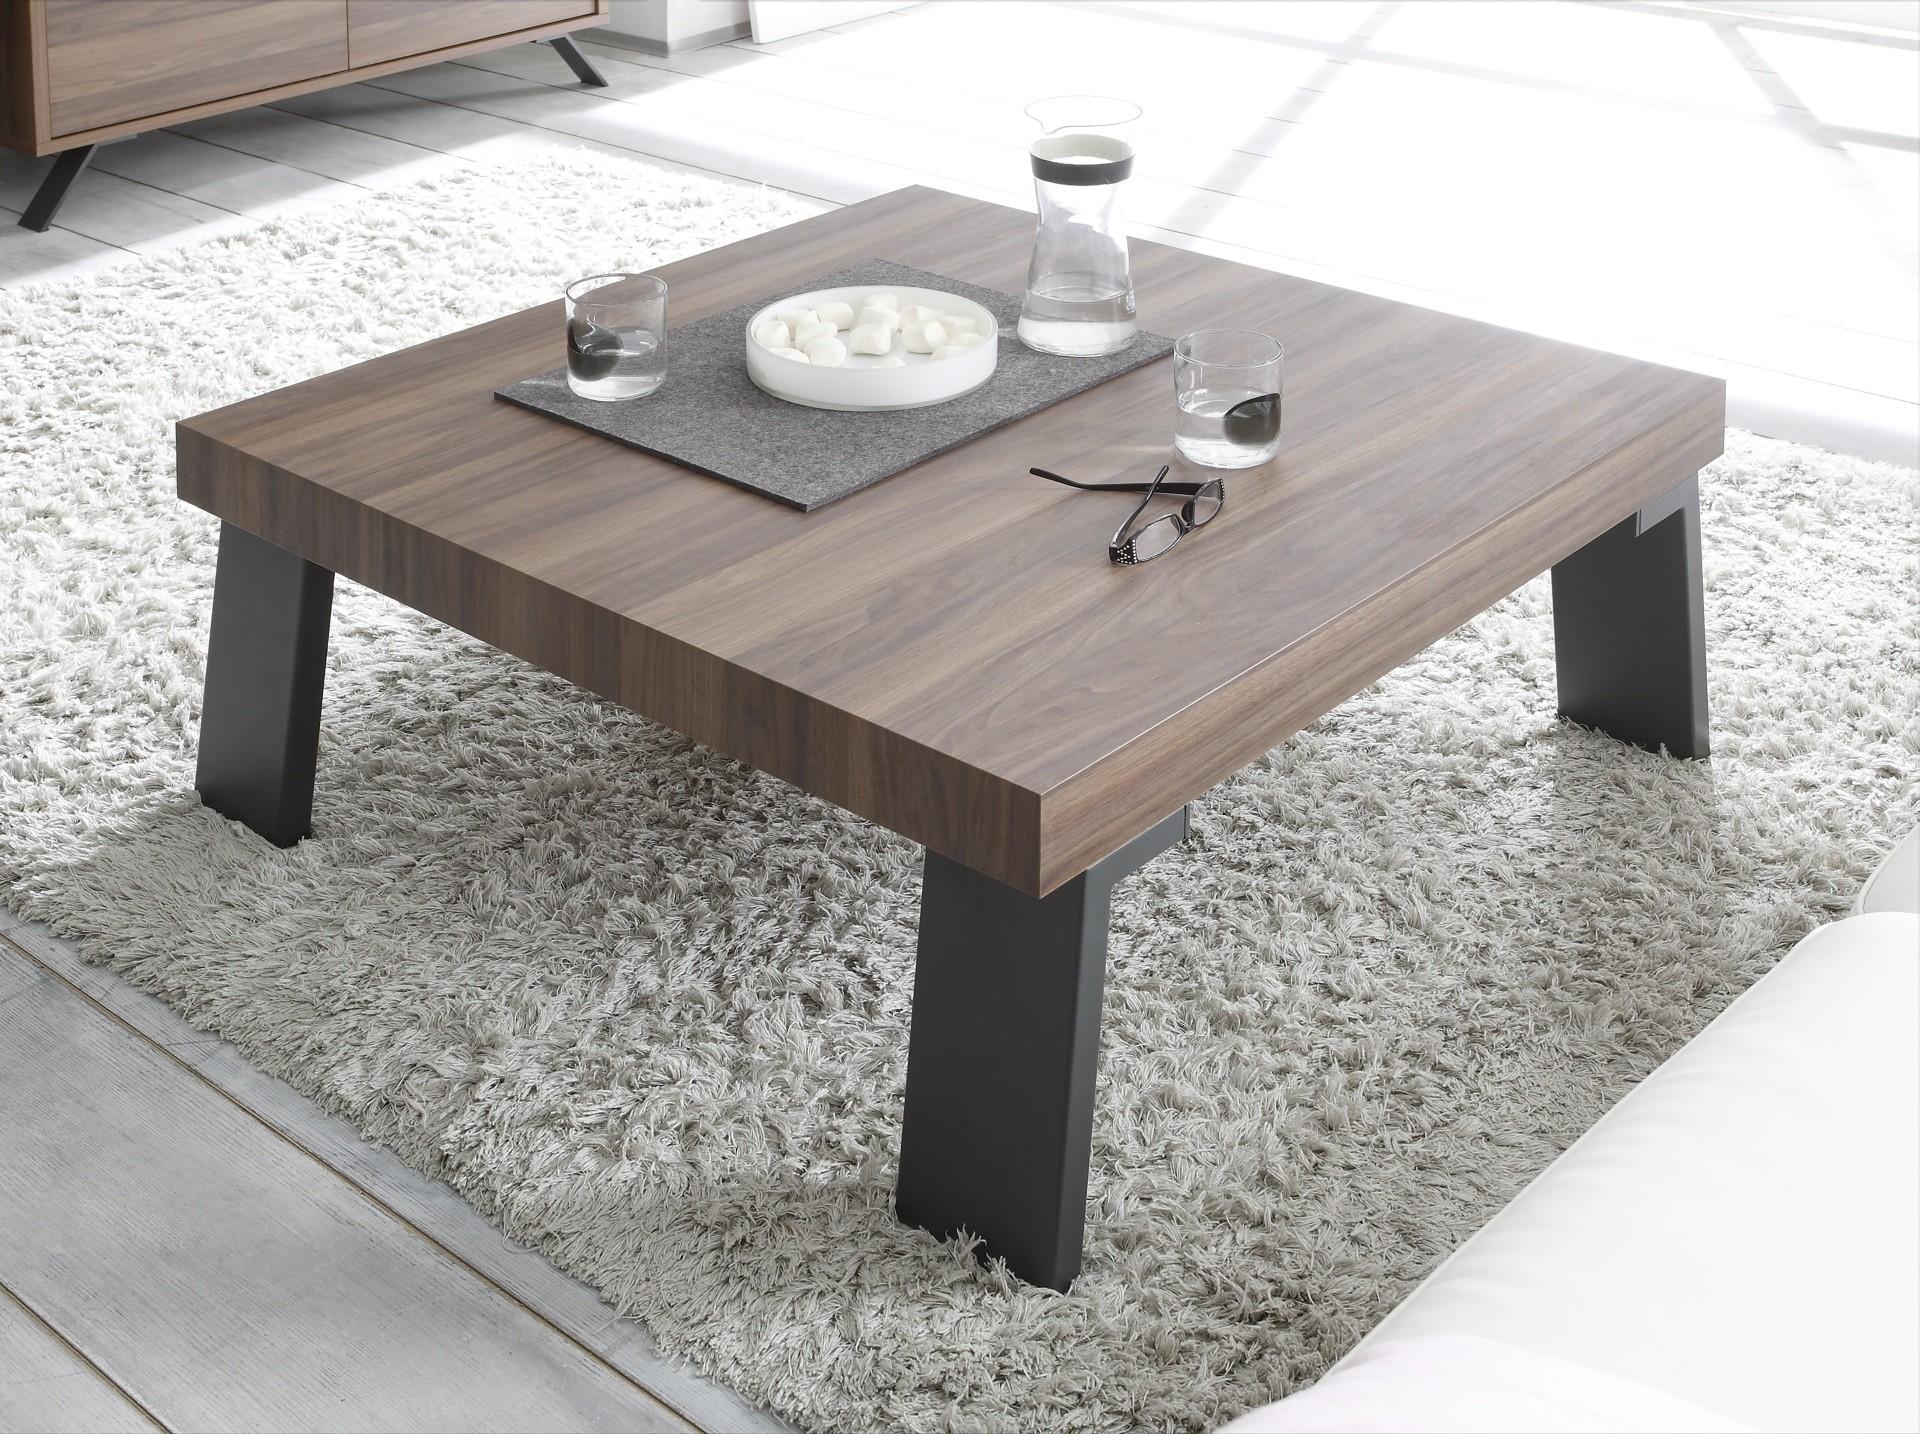 Parma Dark Walnut coffee table with steel legs Coffee tables